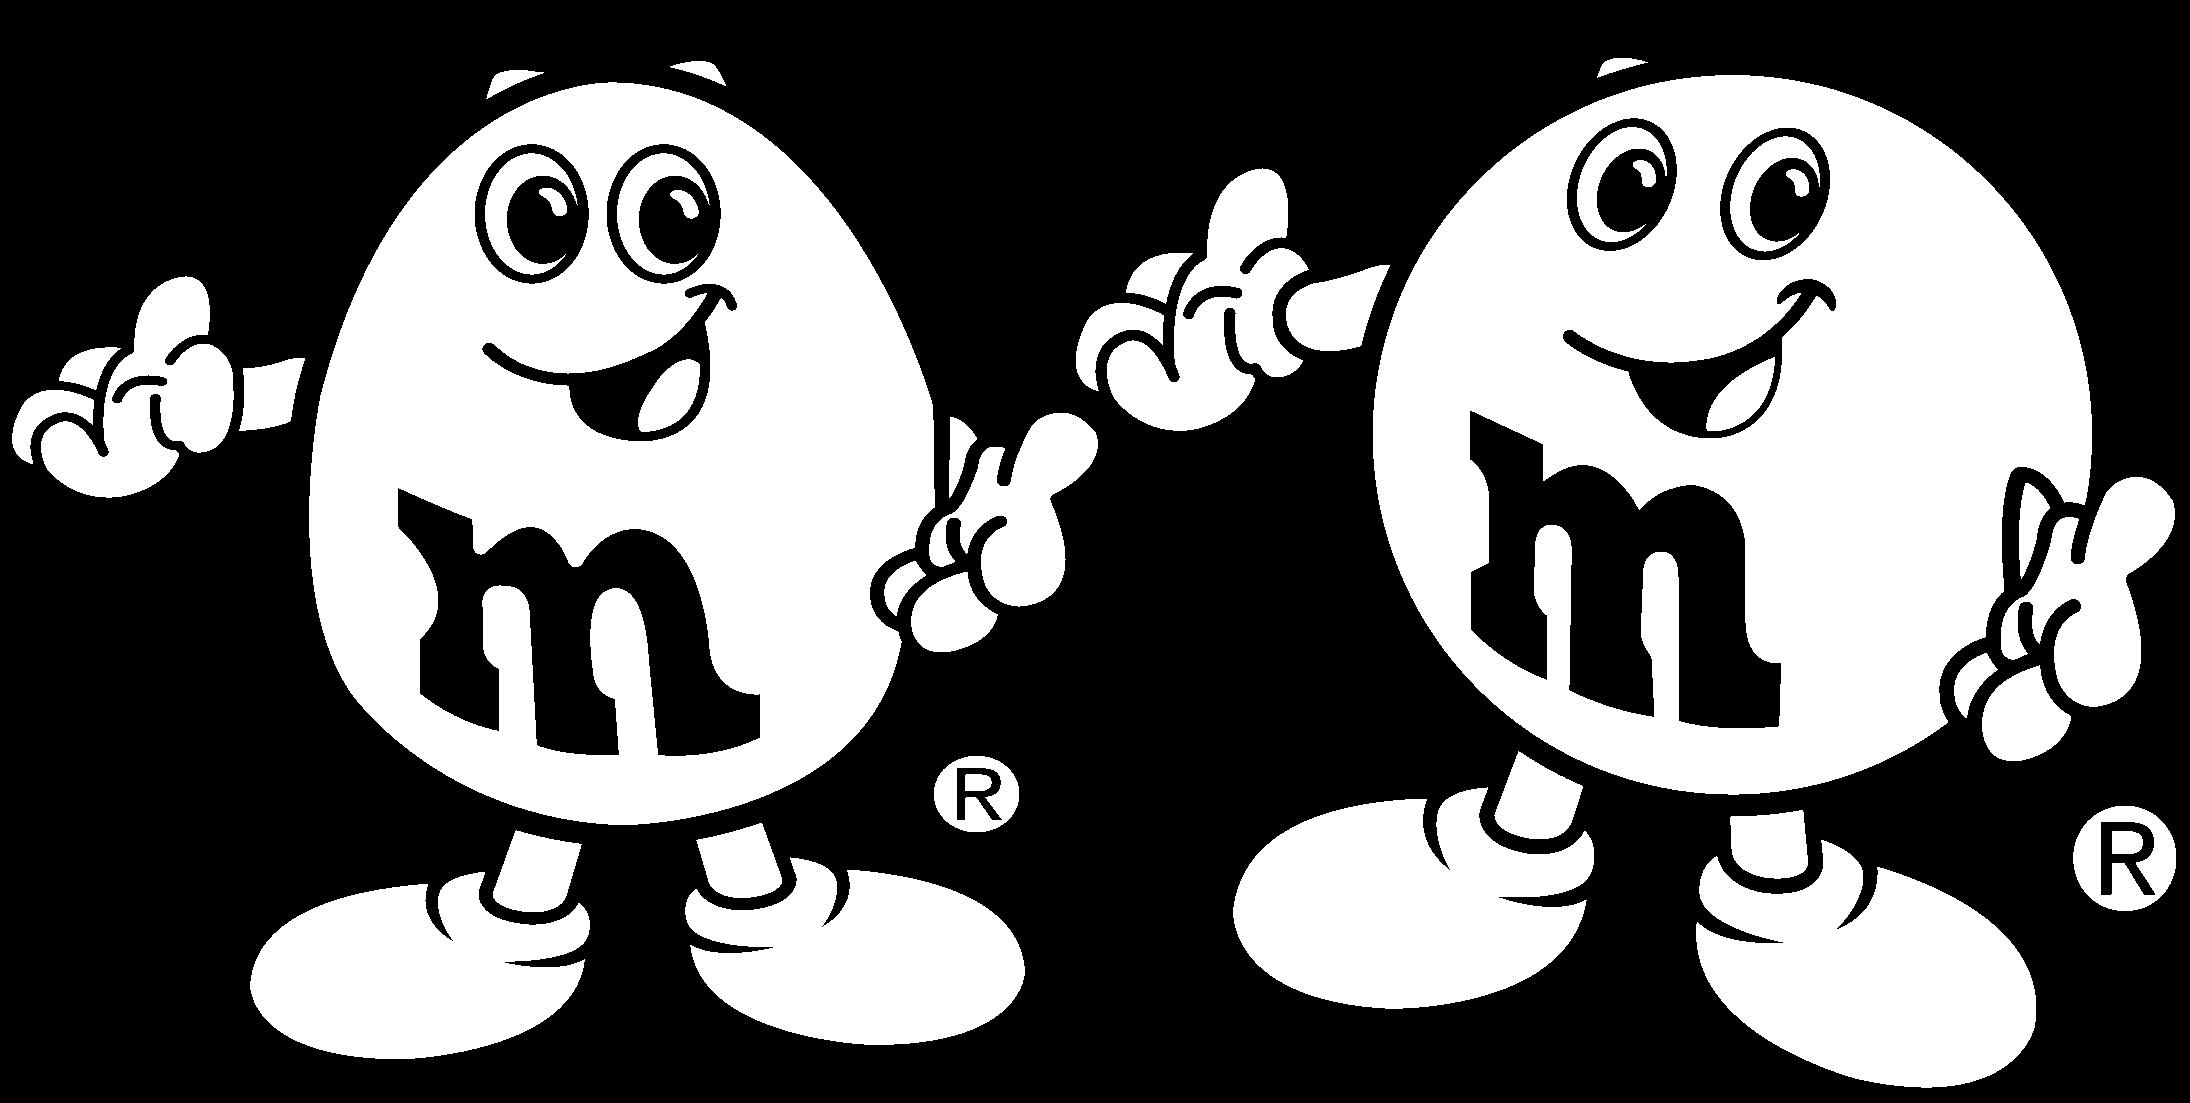 M&m's Logo Black And White.